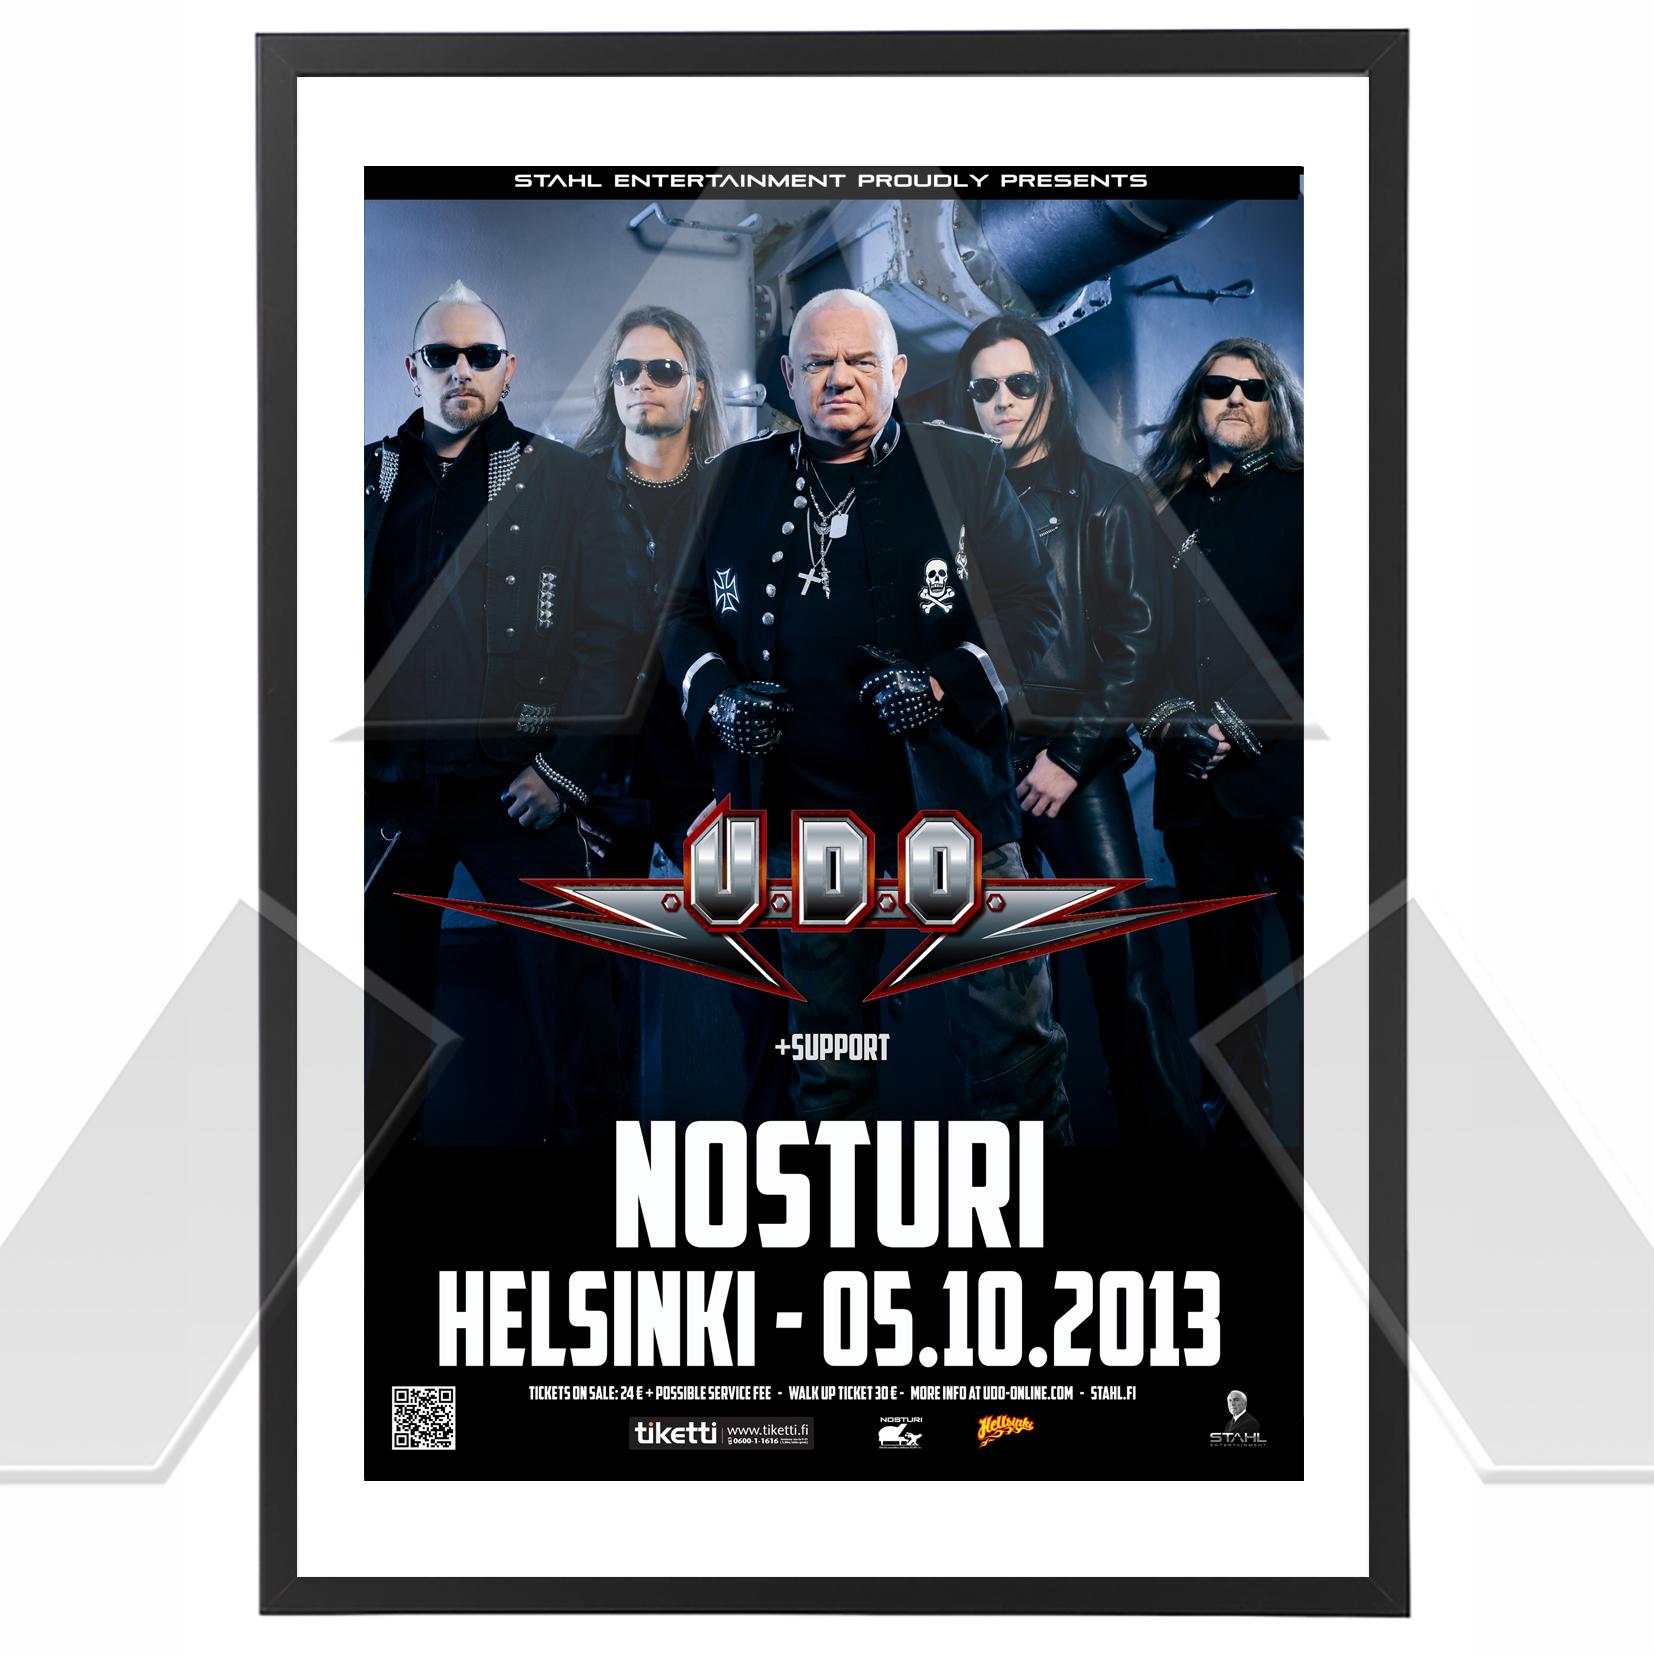 U.D.O. ★ Finland 2013 (tour poster)